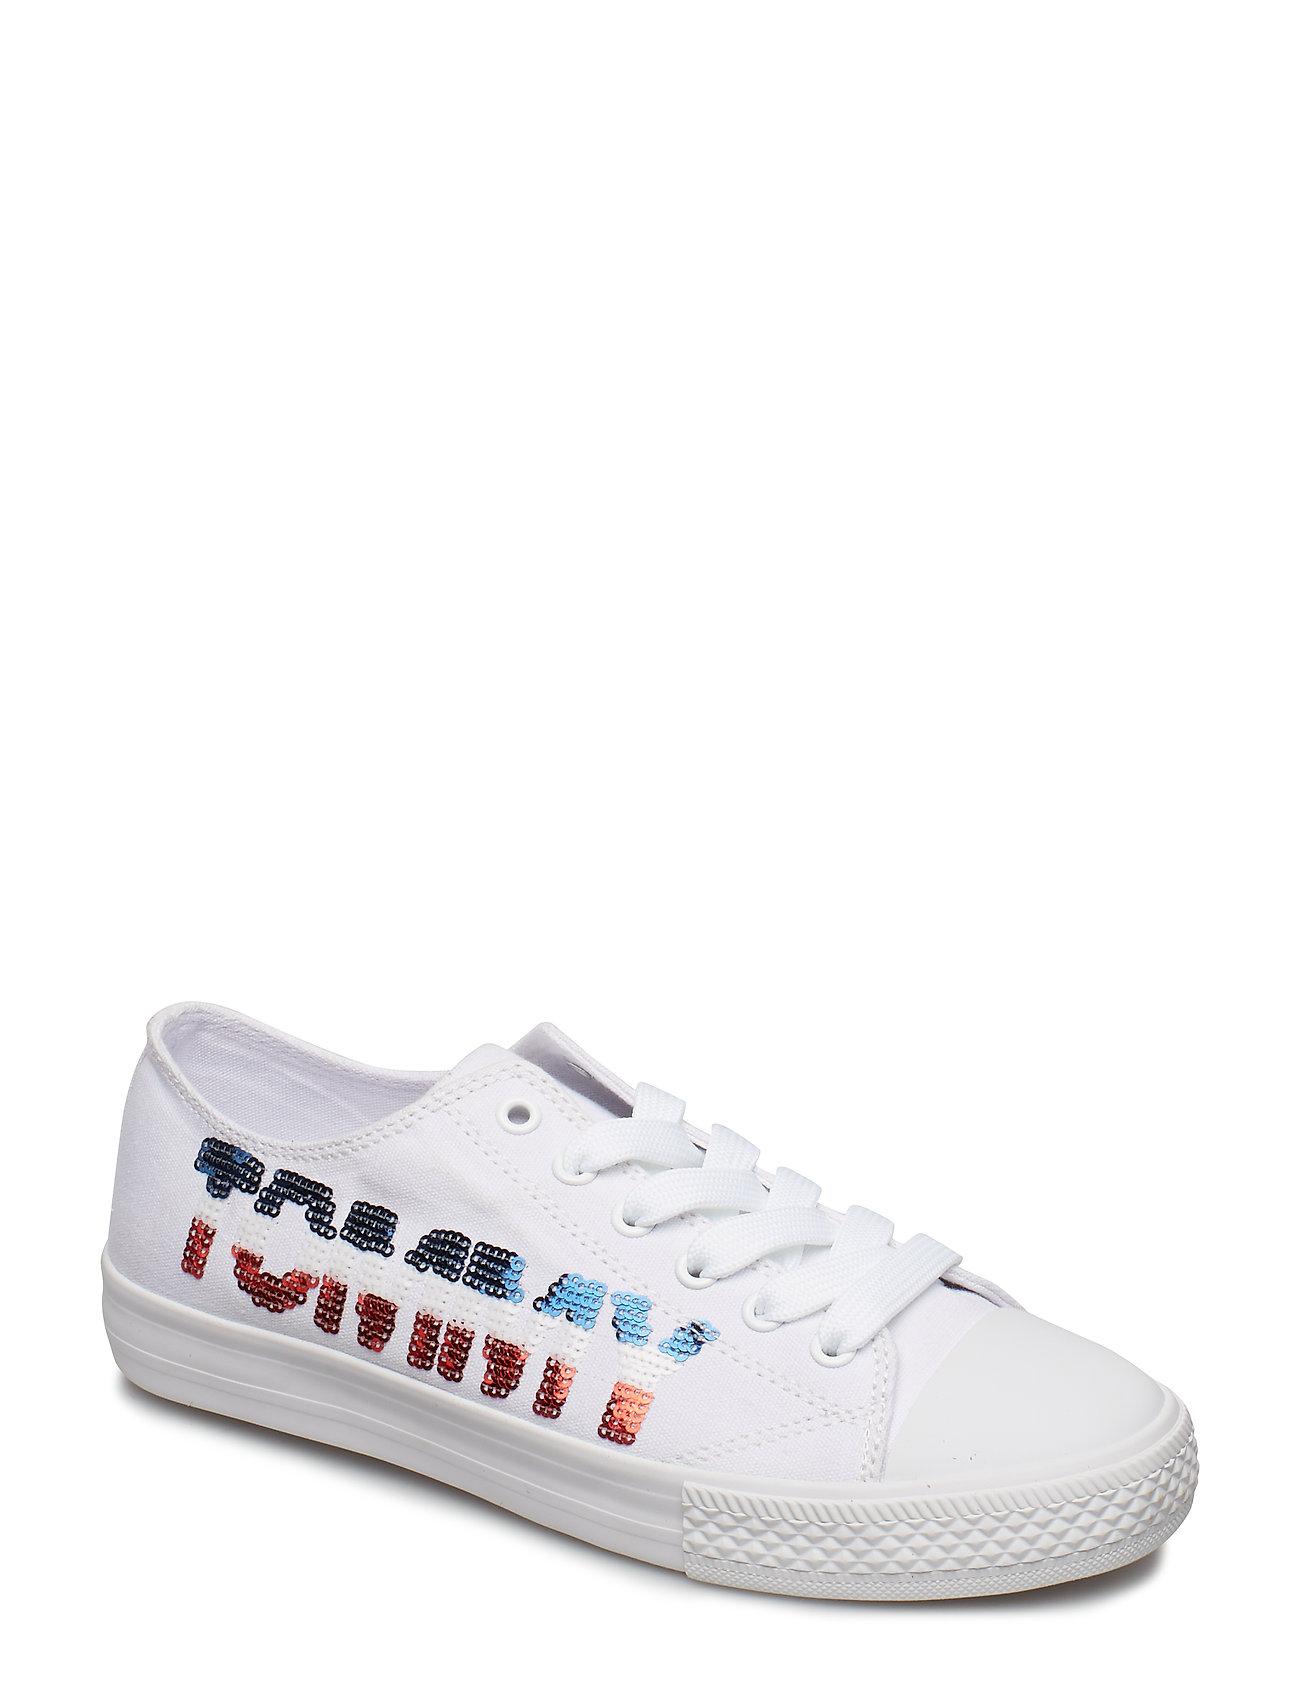 9b7709f4 Tommy Hilfiger sneakers – Low Cut Lace-Up (Can. Ivory) til børn i ...